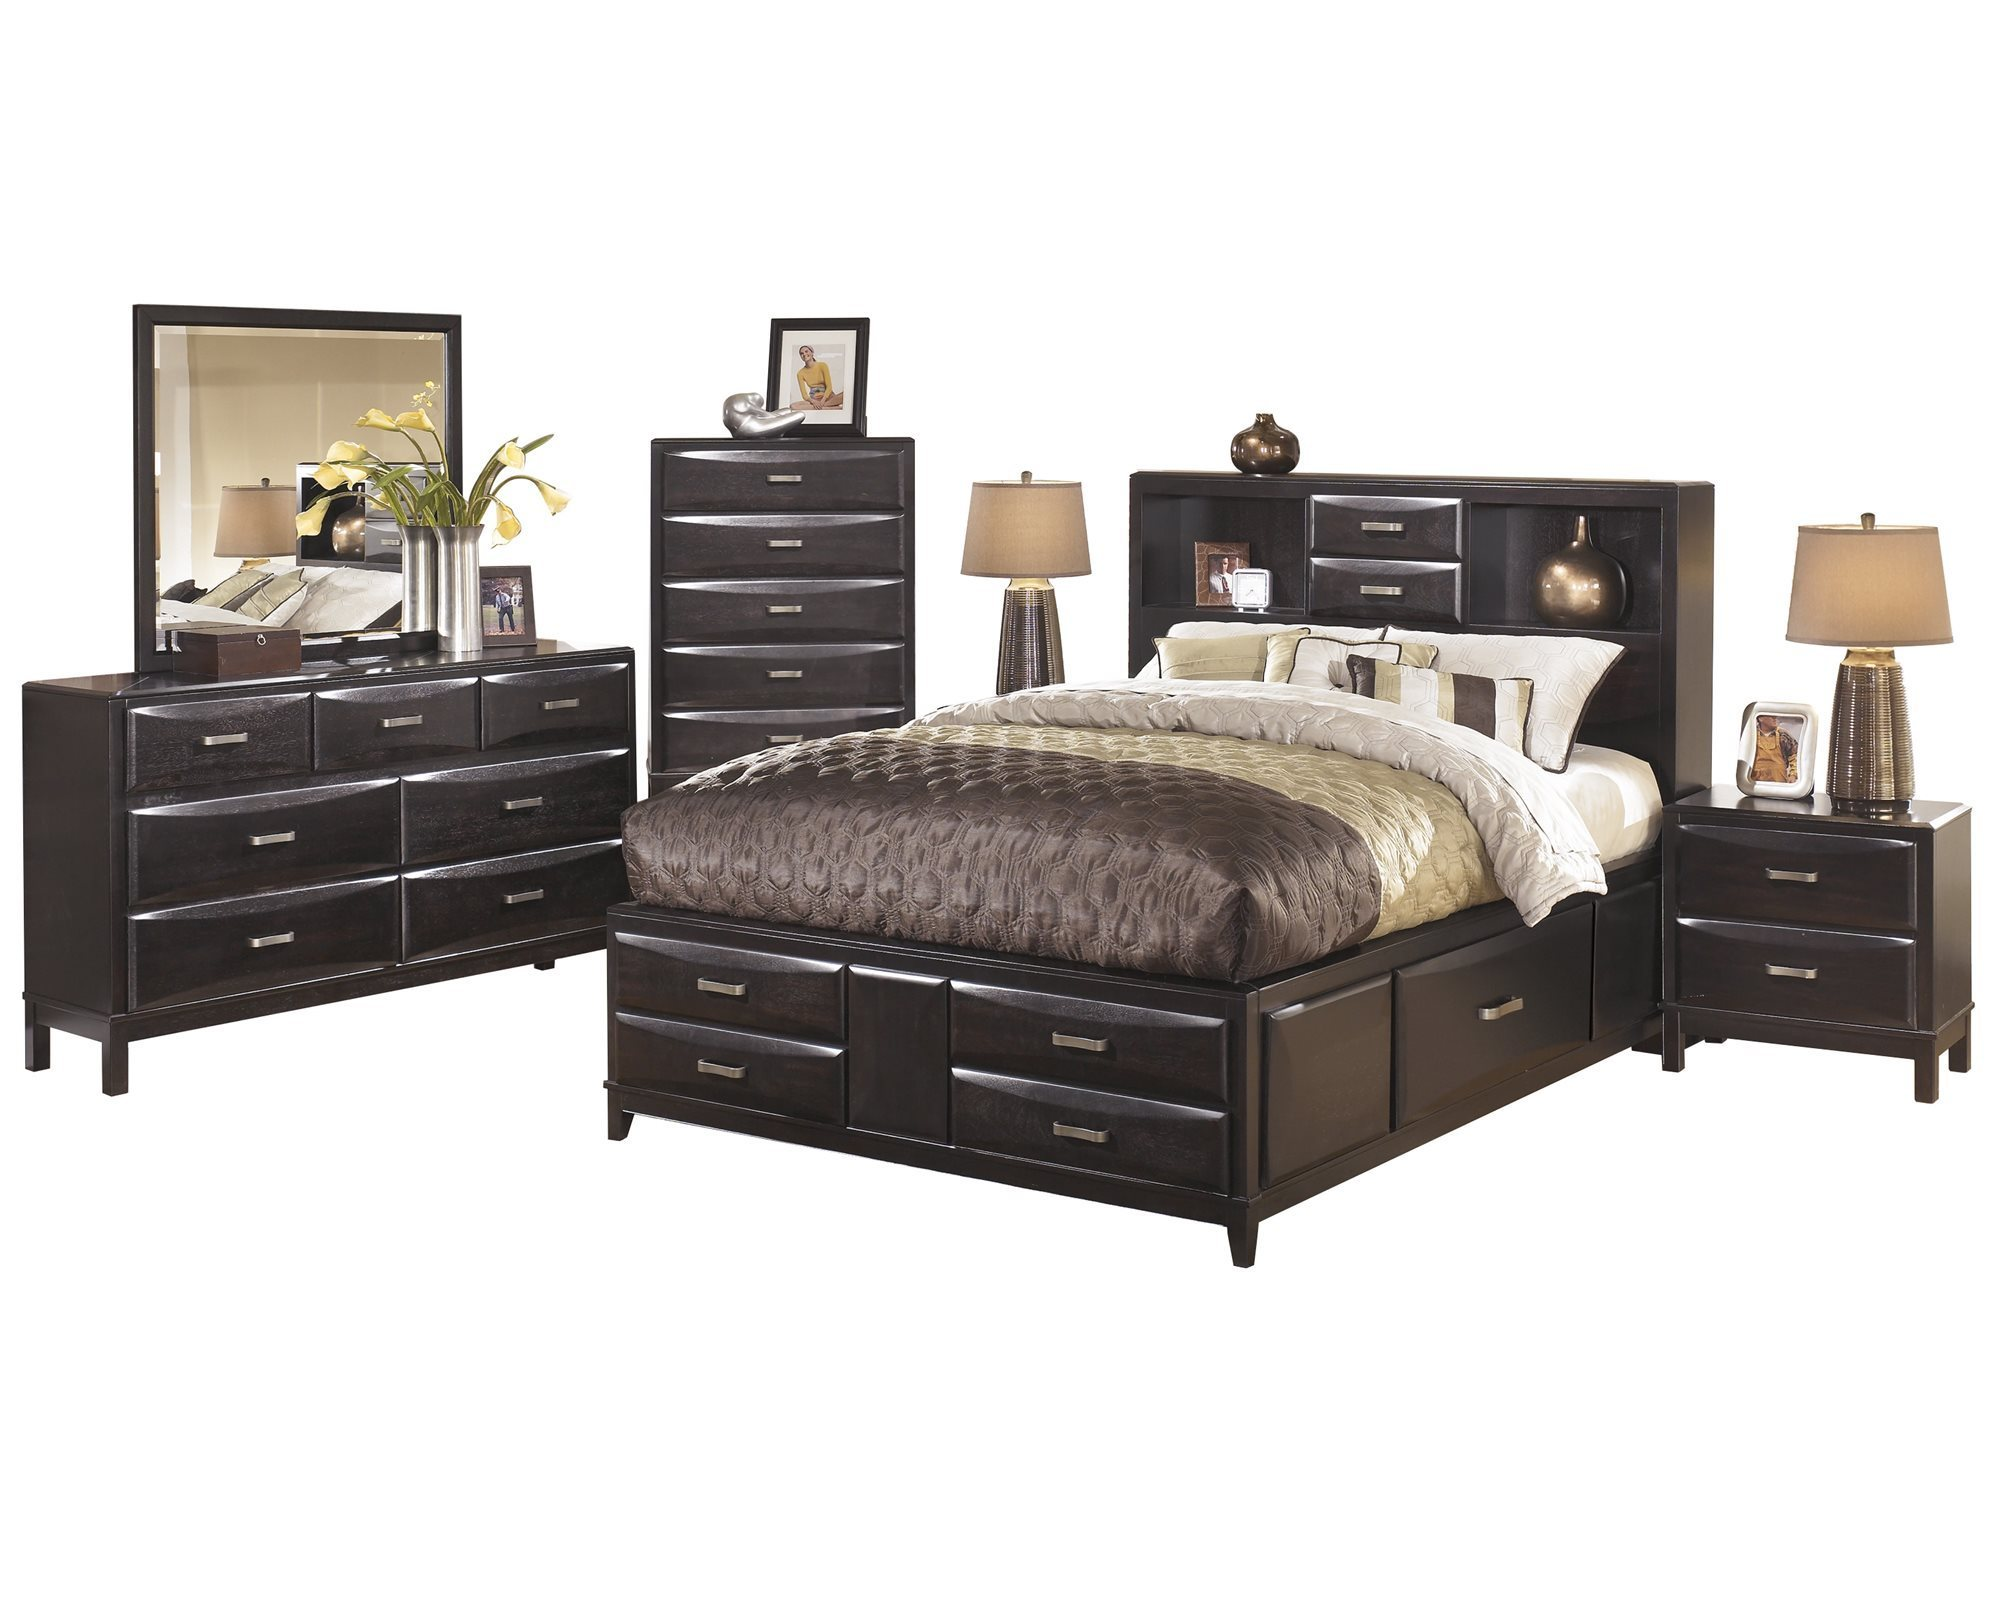 ashley furniture kira 6 pc bedroom set queen storage bed dresser mirror 2 nightstand chest black